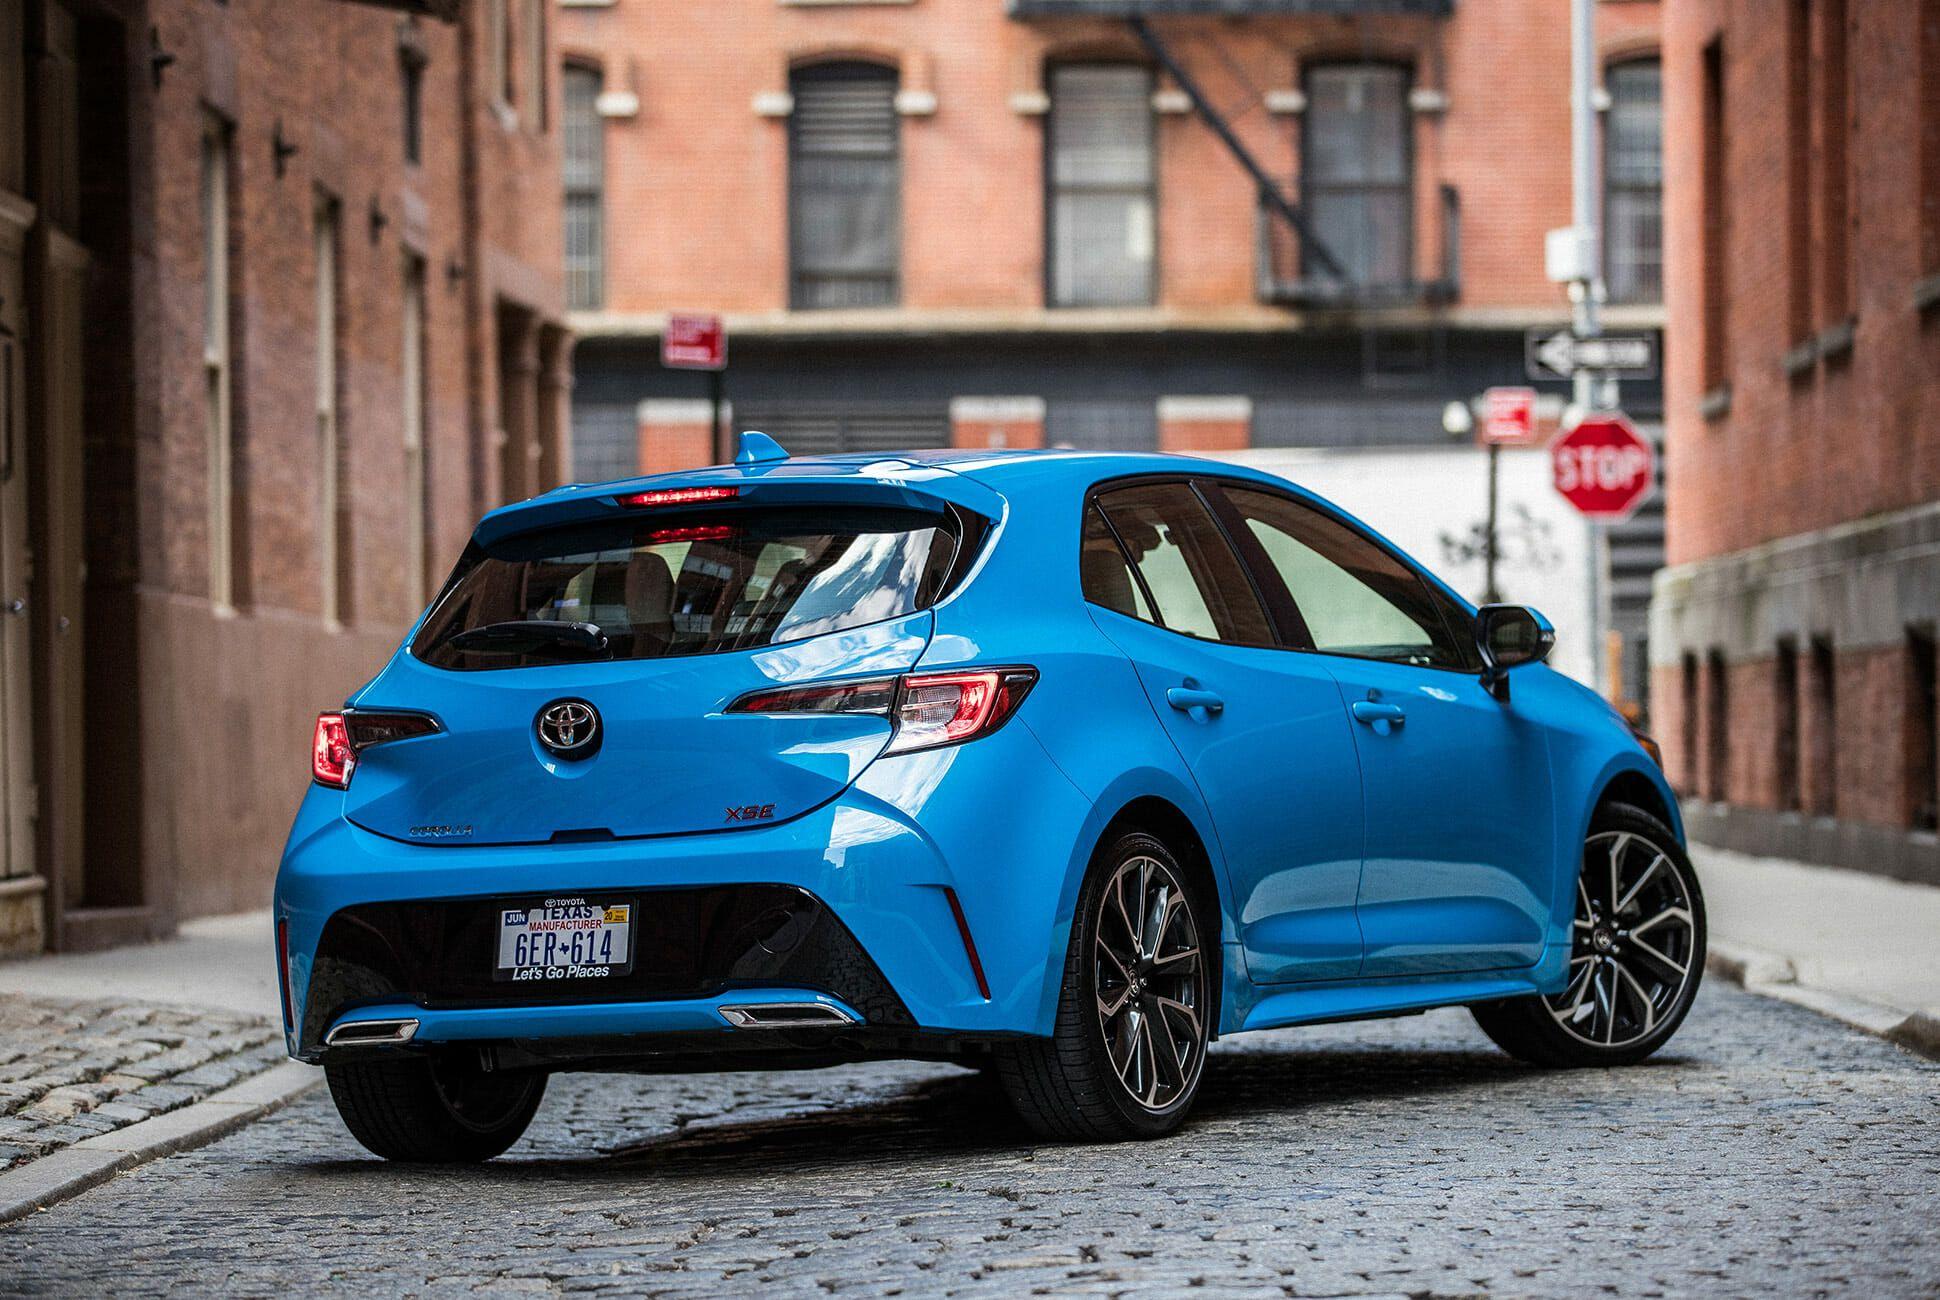 Toyota-Corolla-XSE-Hatch-Review-gear-patrol-slide-2